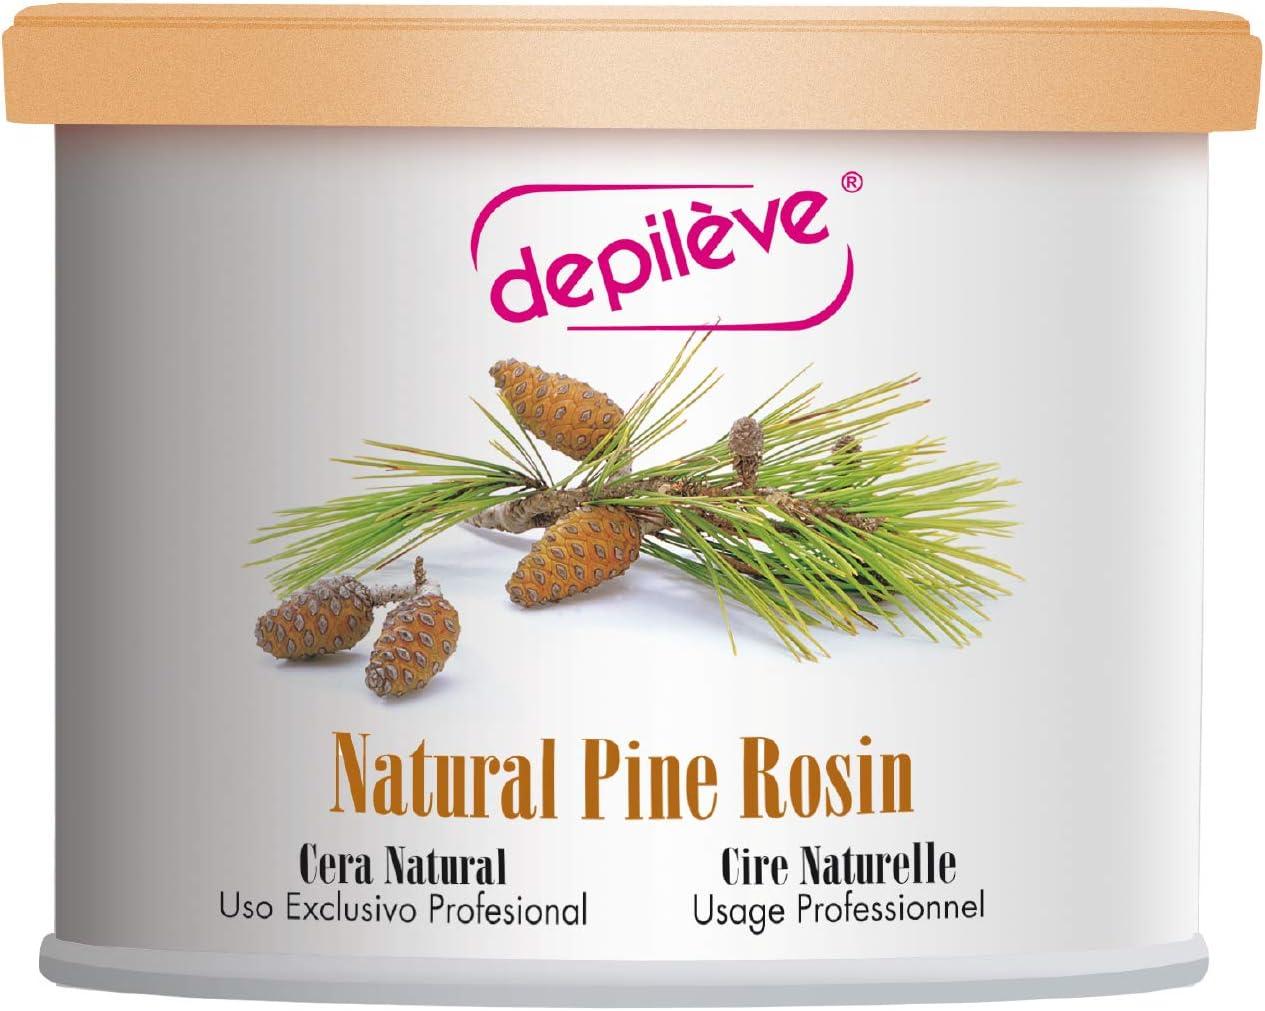 "Depileve Strip Wax for Hair Removal -Pine Rosin Wax 14 oz -The""Original"" All-Purpose Pine Rosin Depilatory Wax -Fine Hair Wax -Full Body Wax"